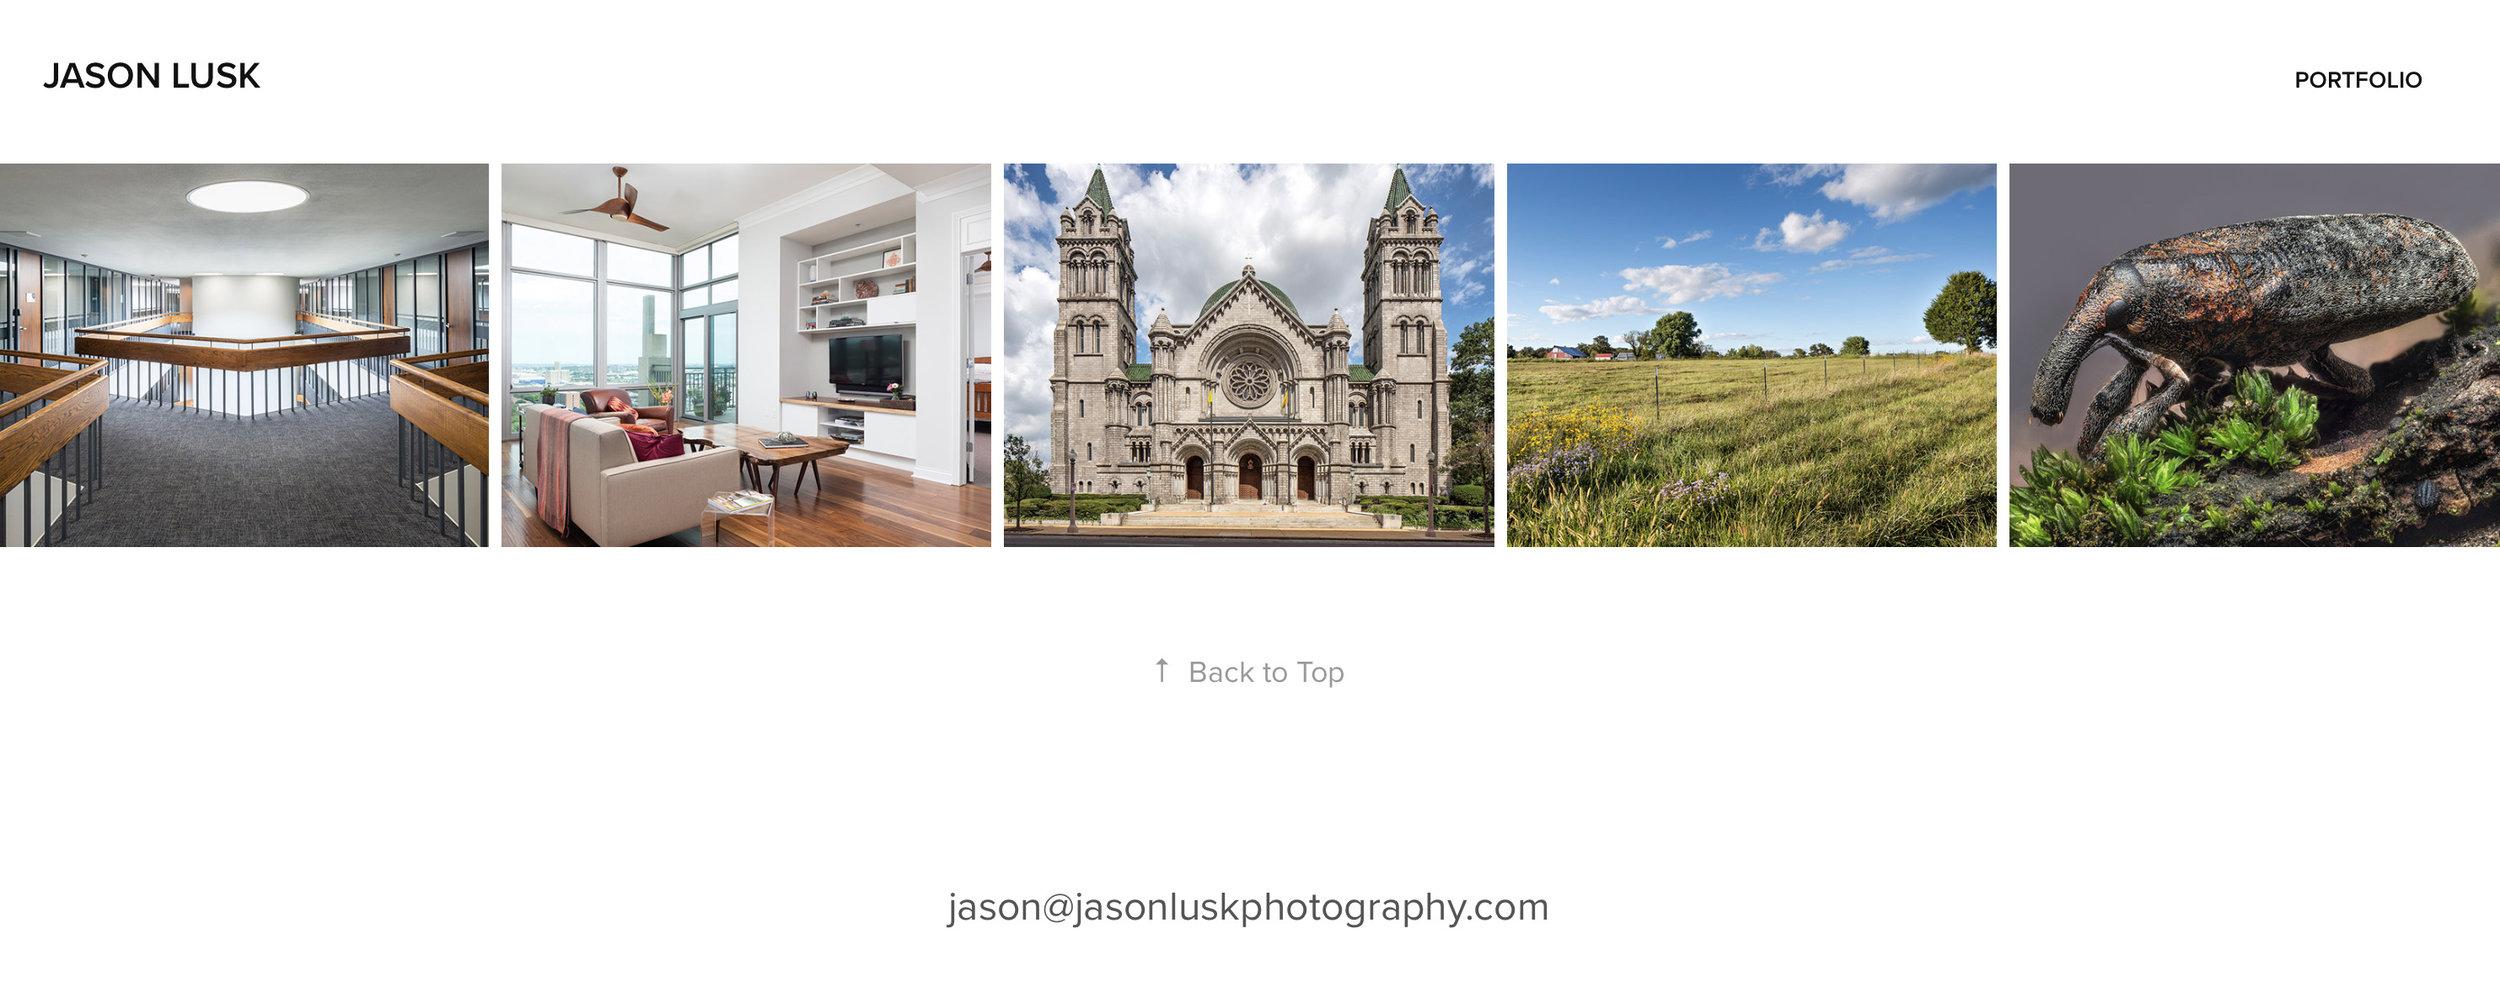 photographer-of-homes-new-portfolio-site-link-hub-jason-lusk.jpg